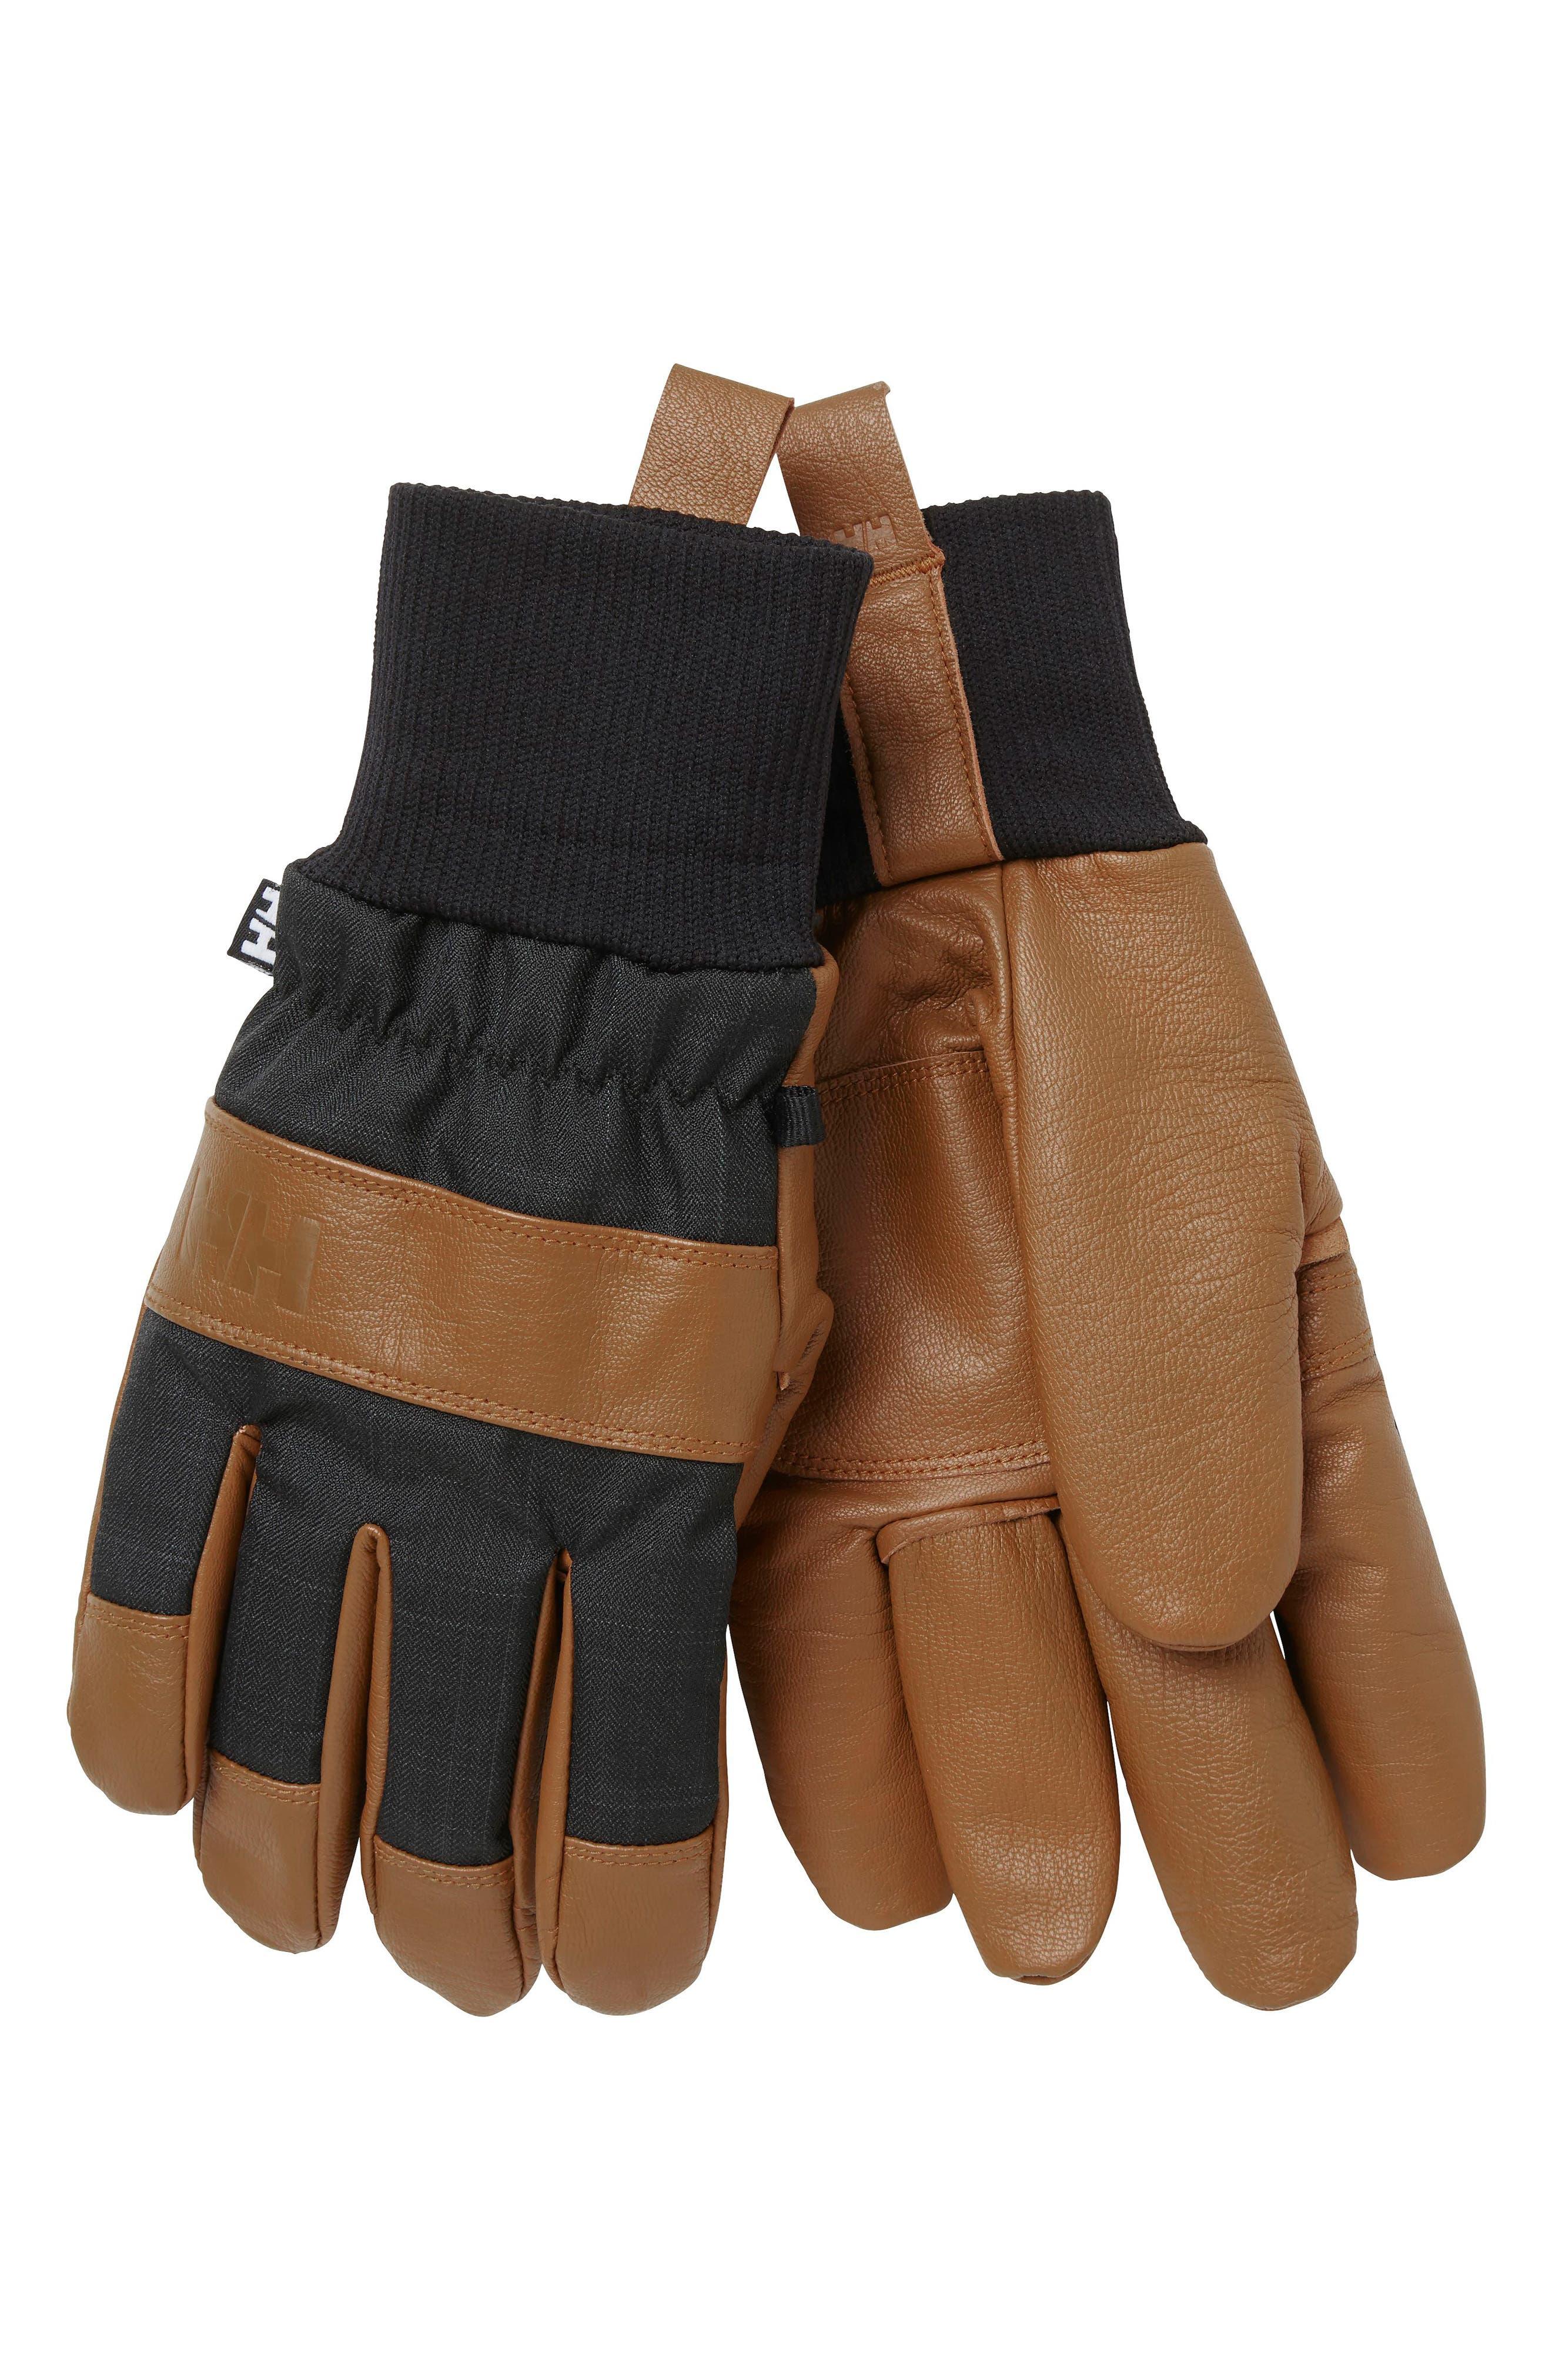 Alternate Image 1 Selected - Helly Hansen Dawn Patrol Gloves